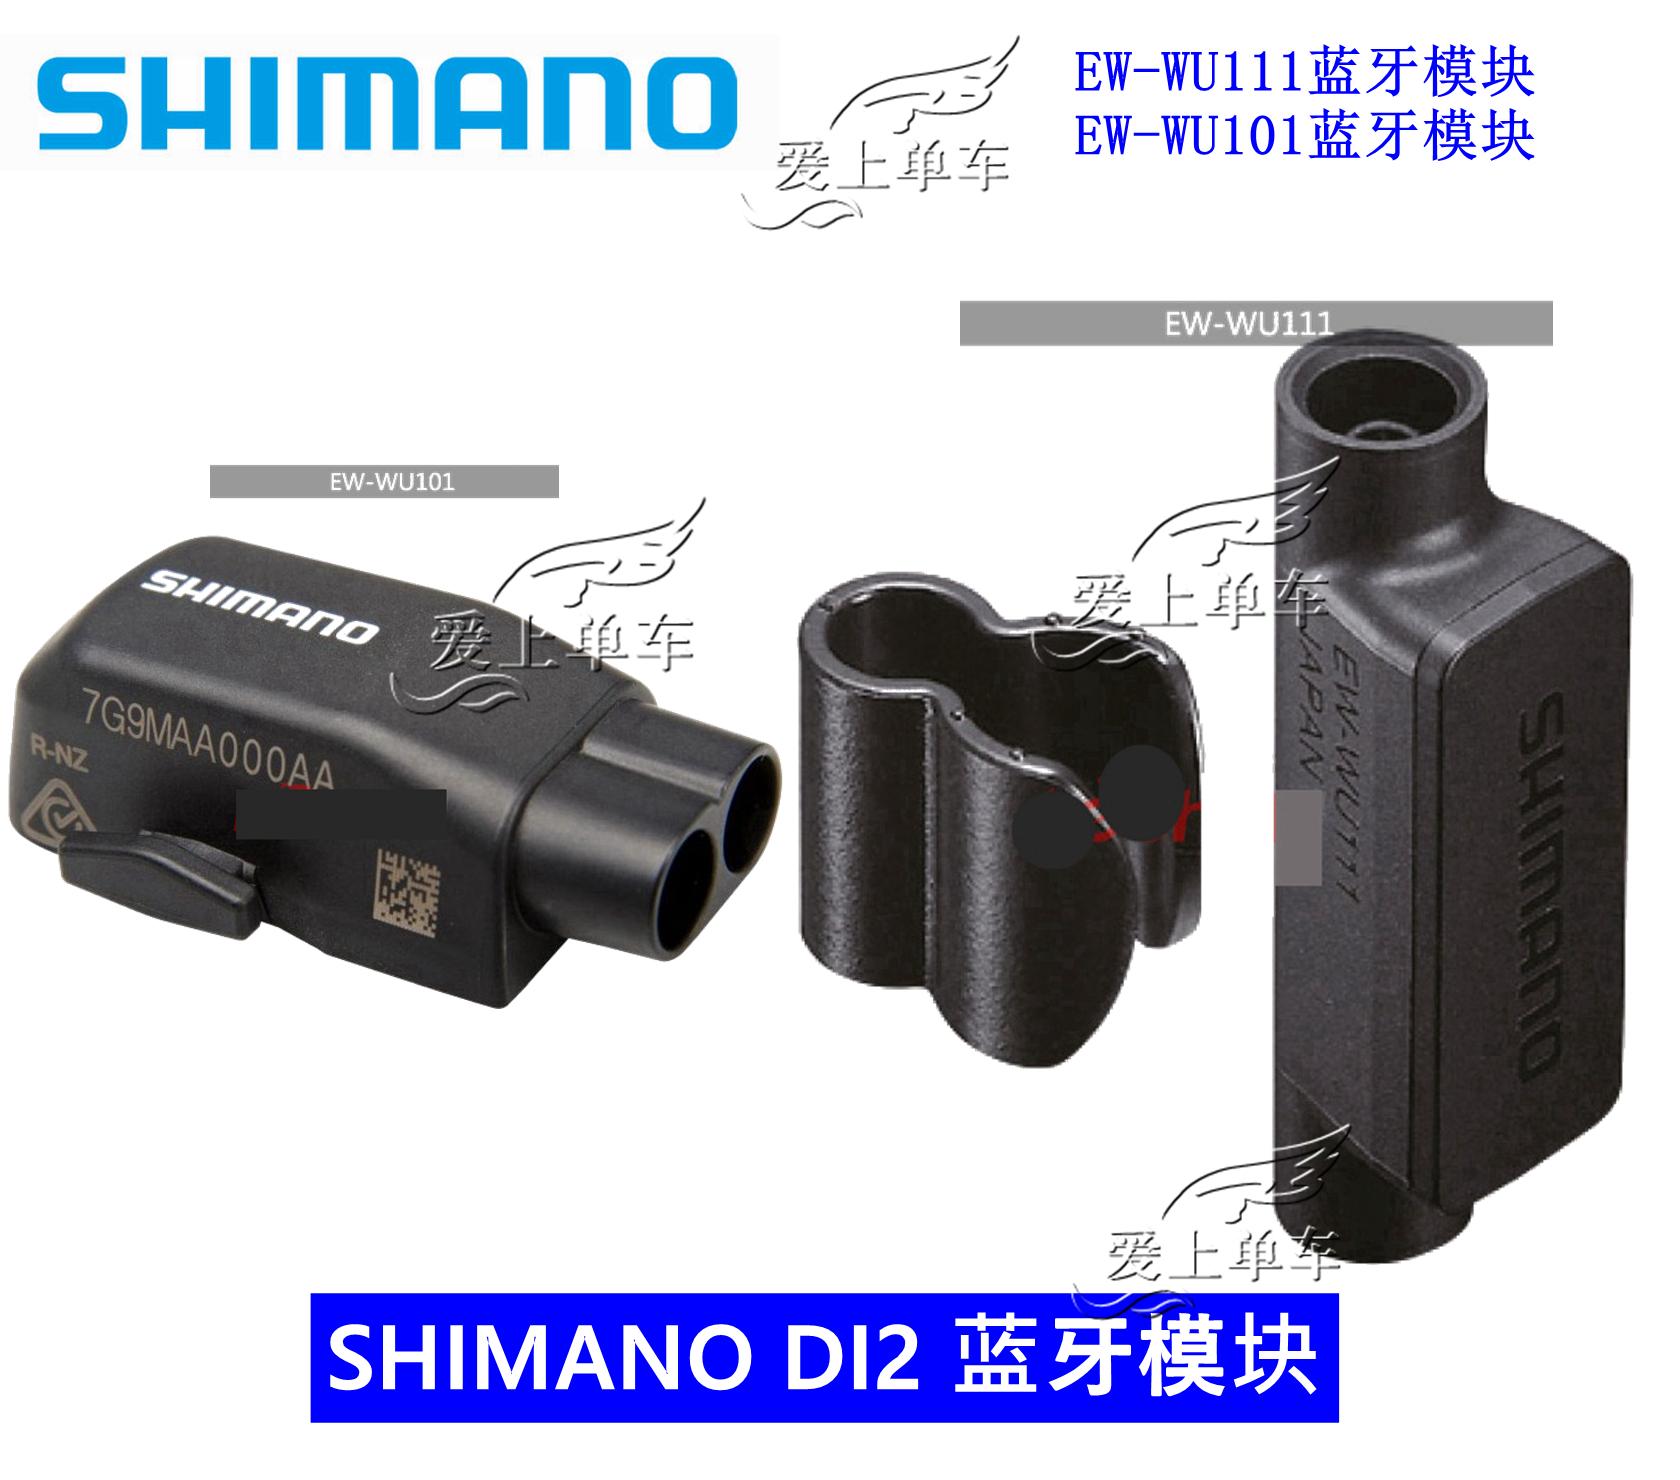 76e7e1471b6 SHIMANO Shimano di2 WU111 101 Bluetooth electric variable ANT wireless  device component transmitter